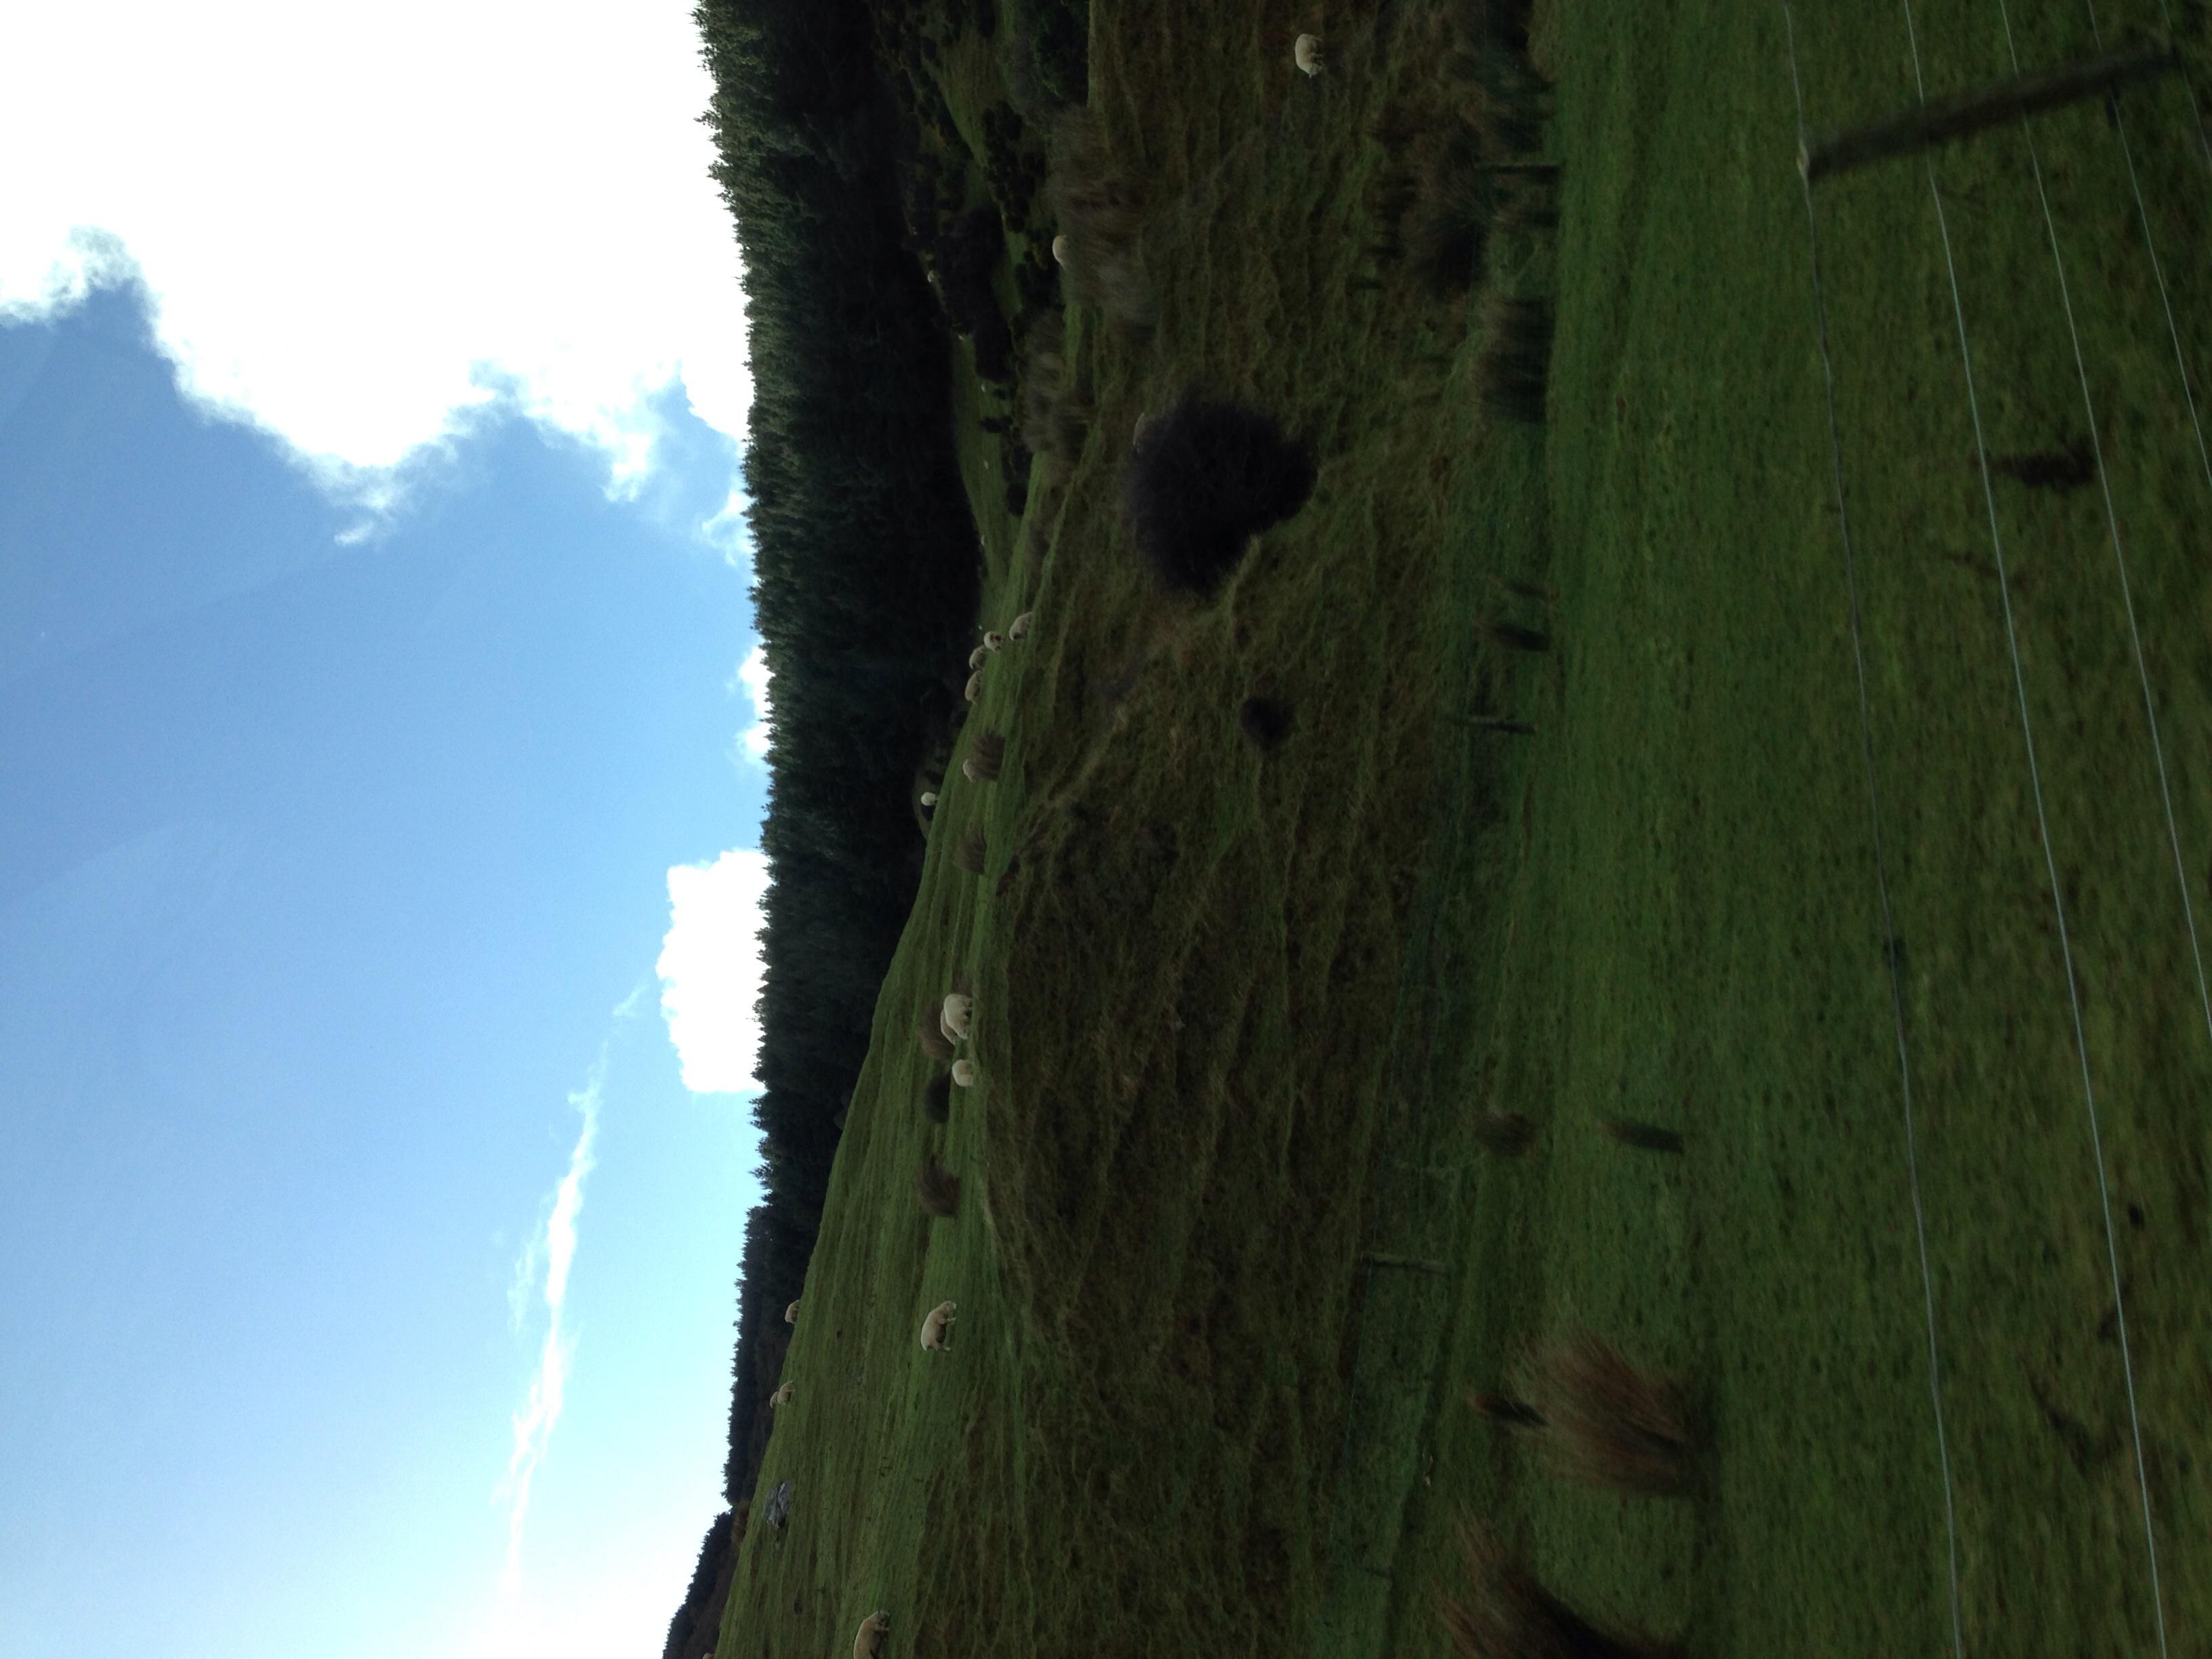 Sheep on a hill along Aramoana Road en route to Aramoana.